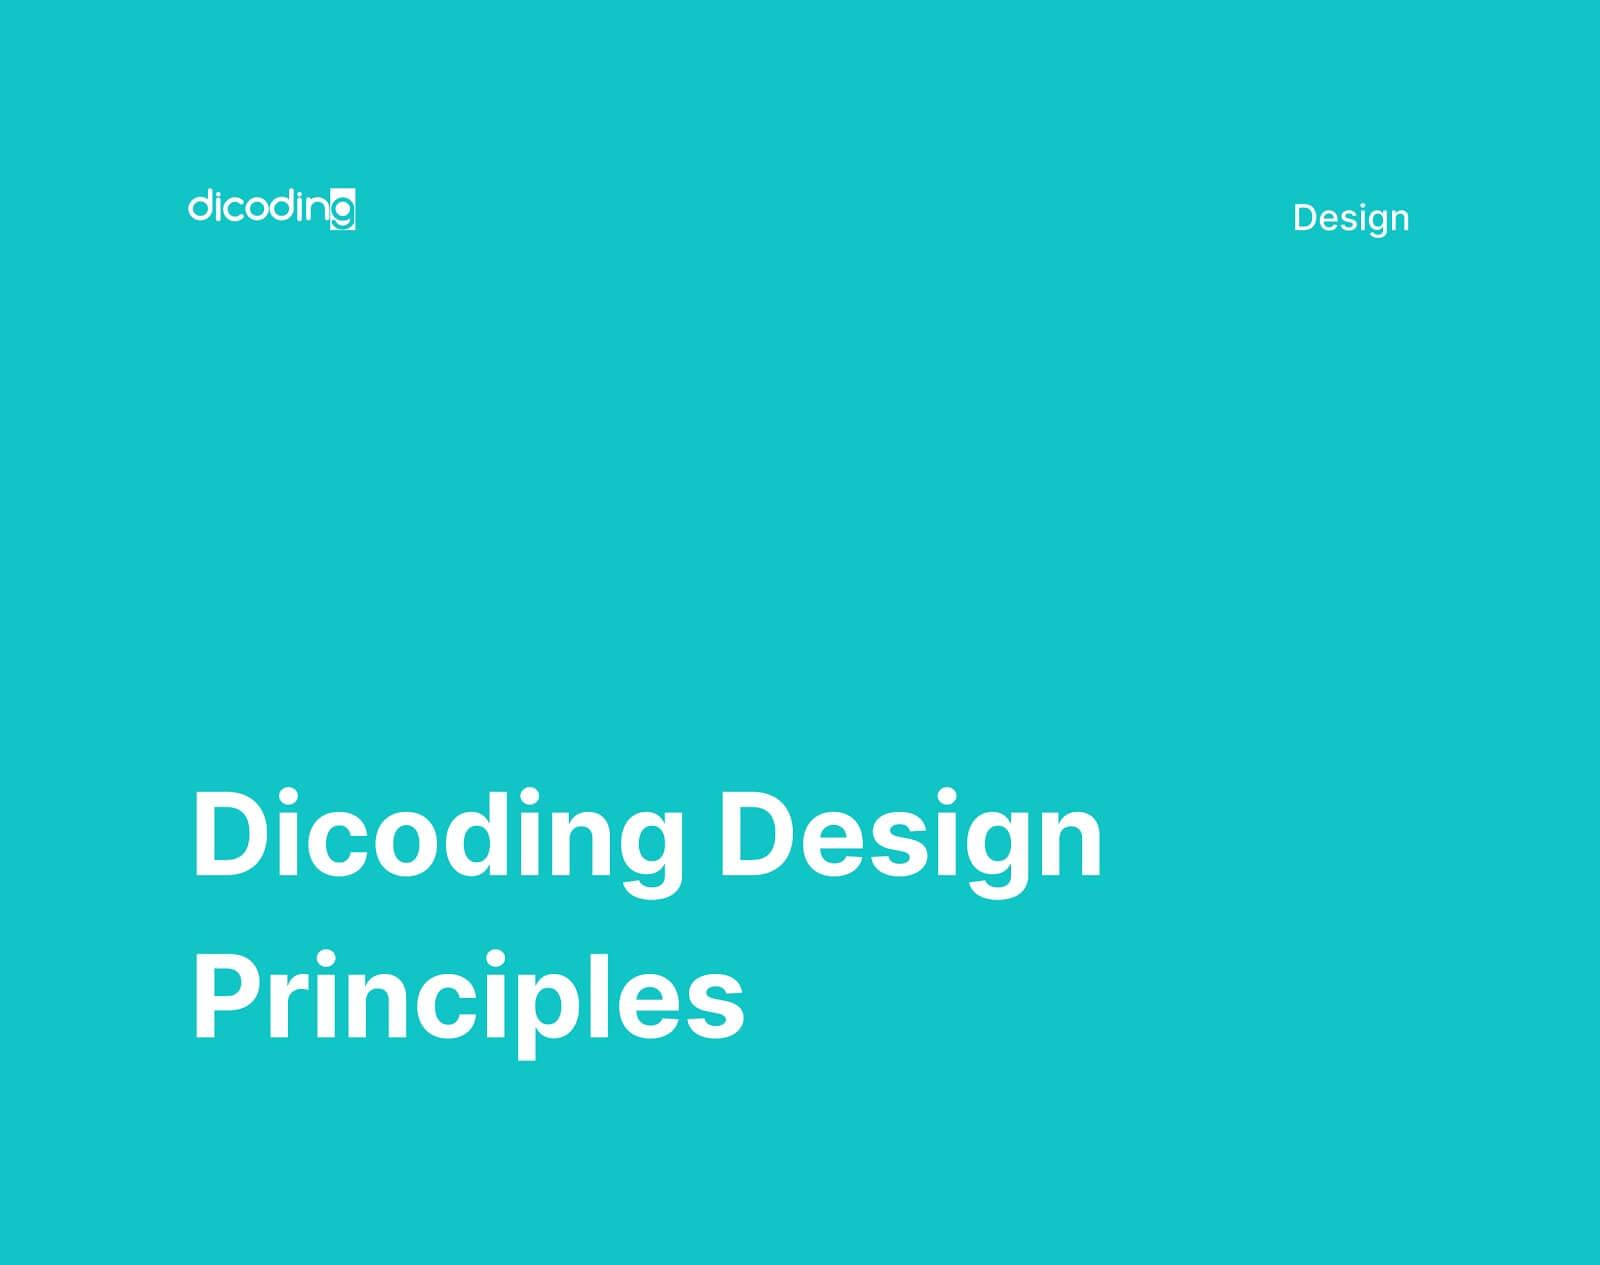 Dicoding Design Principles